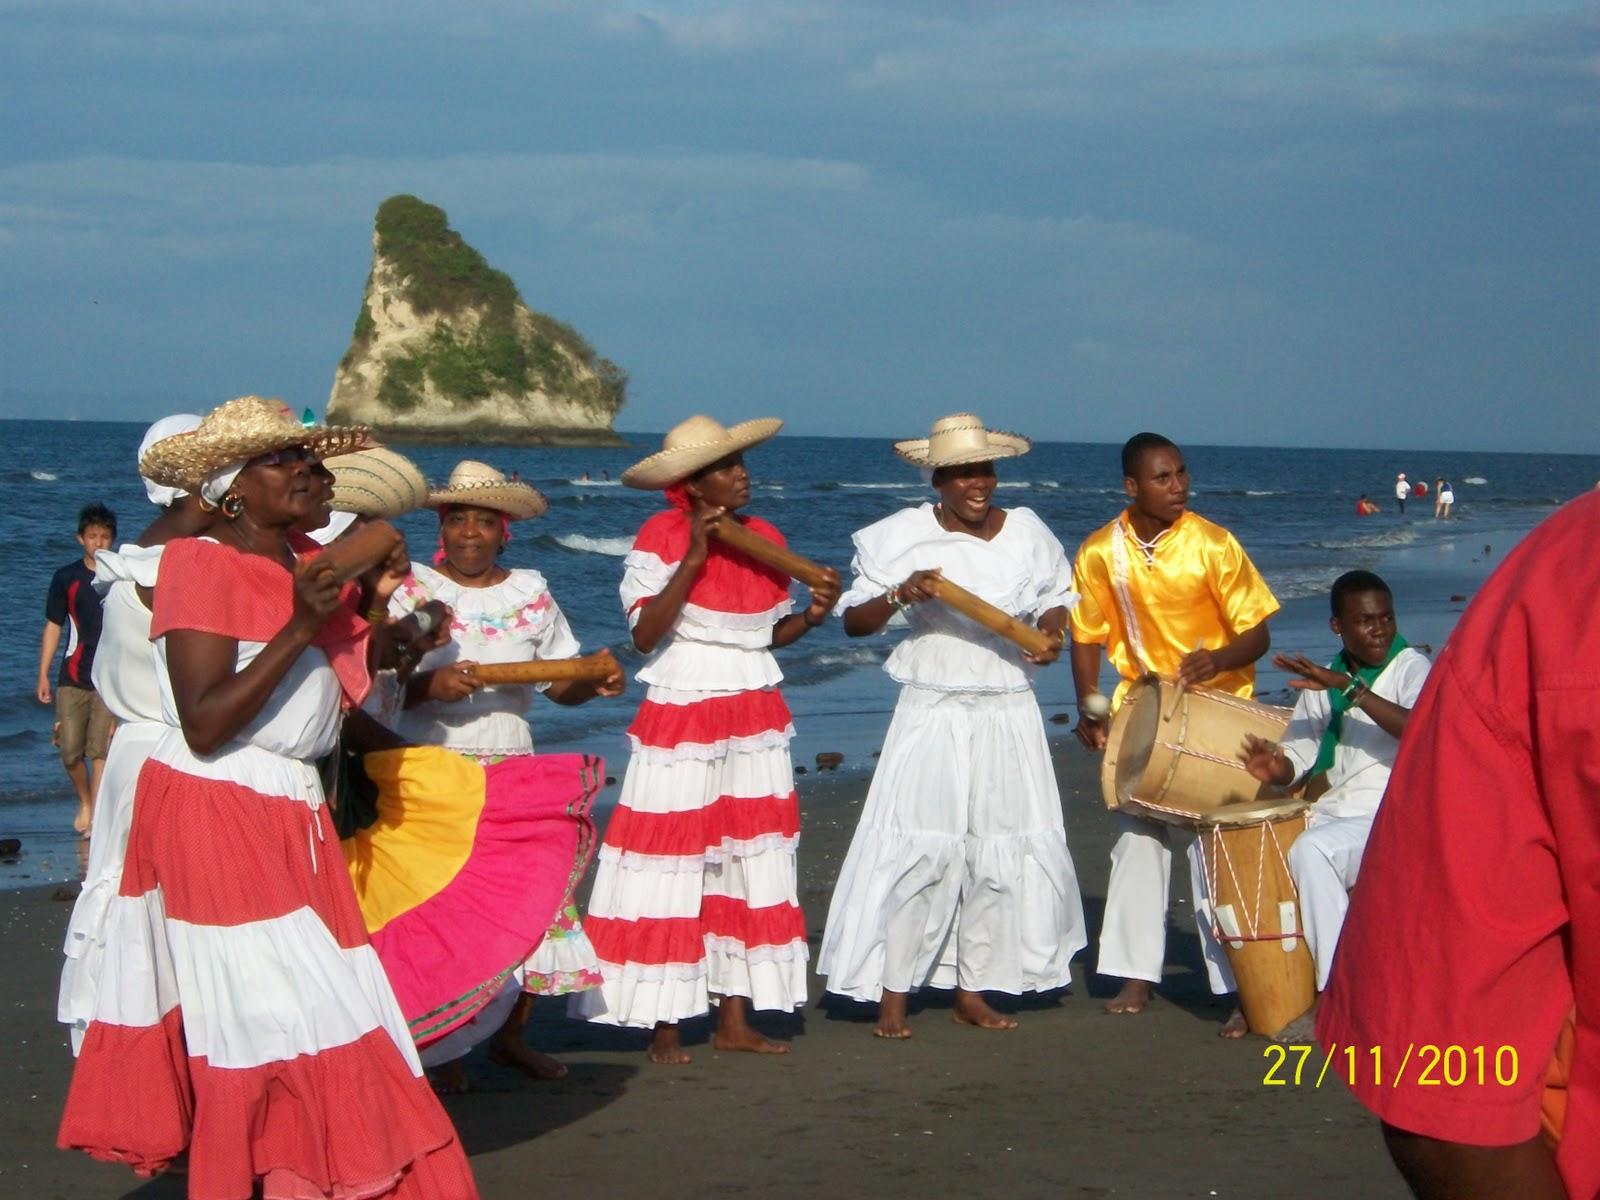 El Morro, Tumaco, Nariño